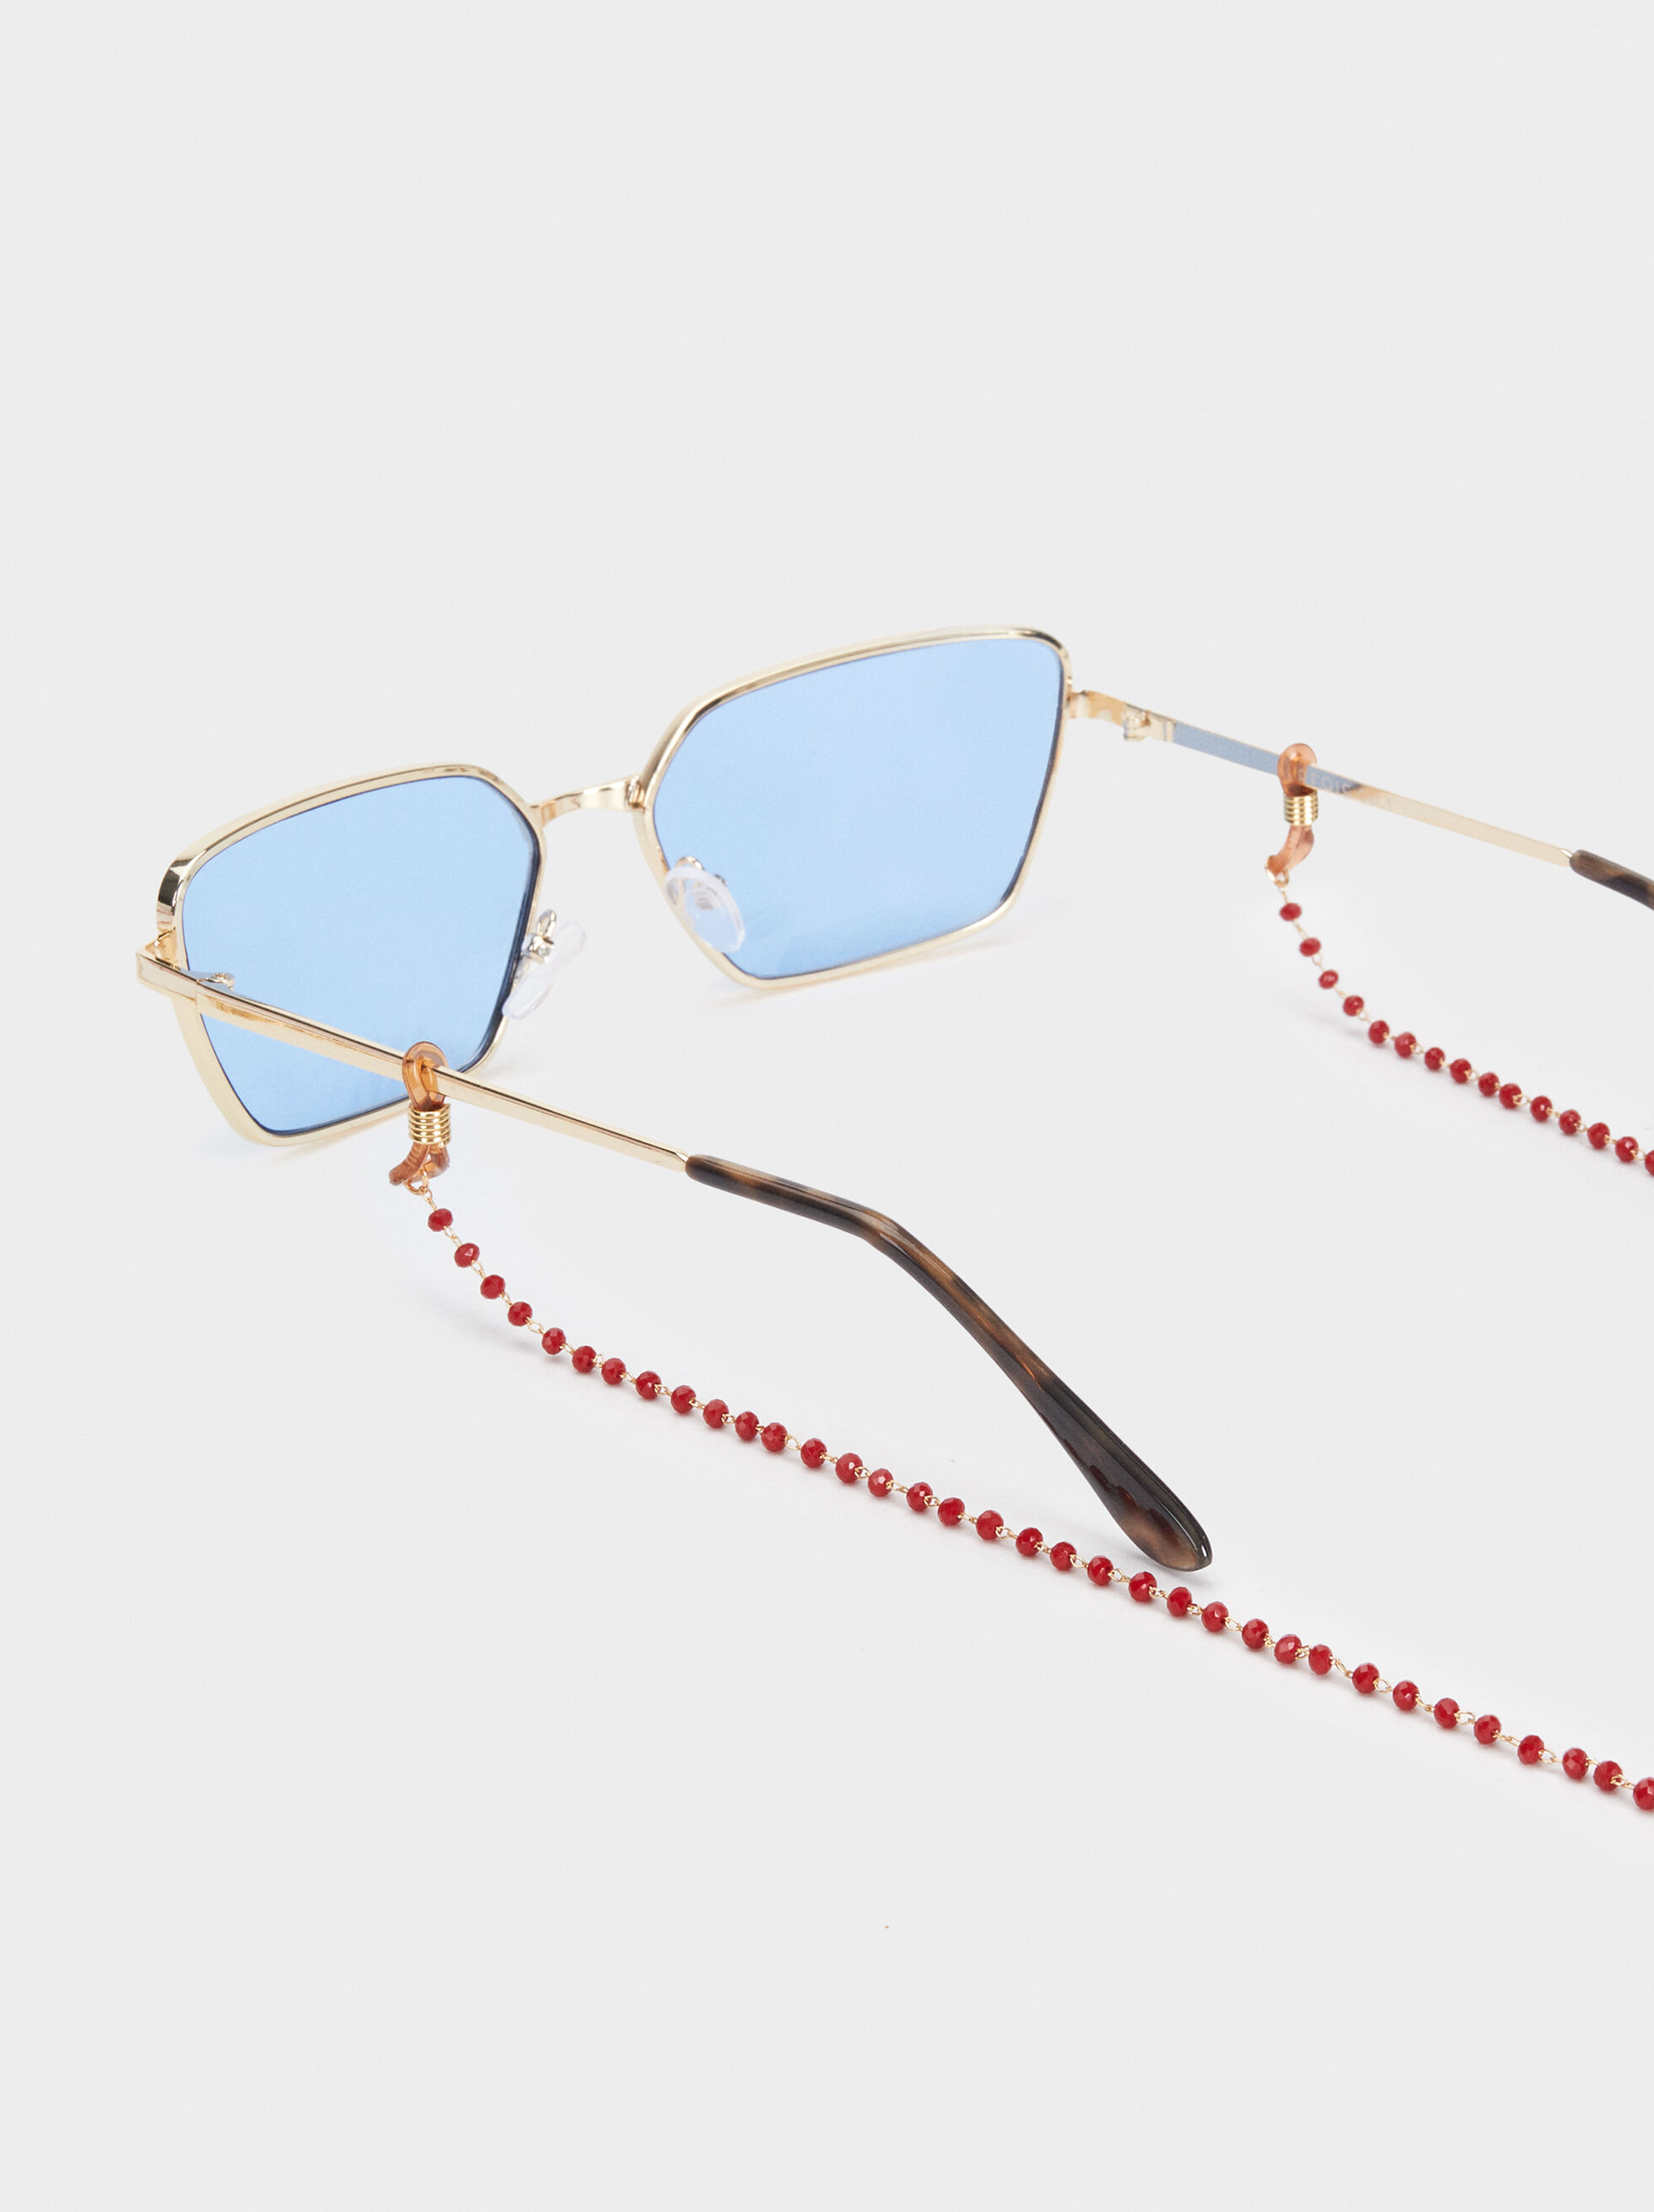 Beaded Glasses Chain, Bordeaux, hi-res